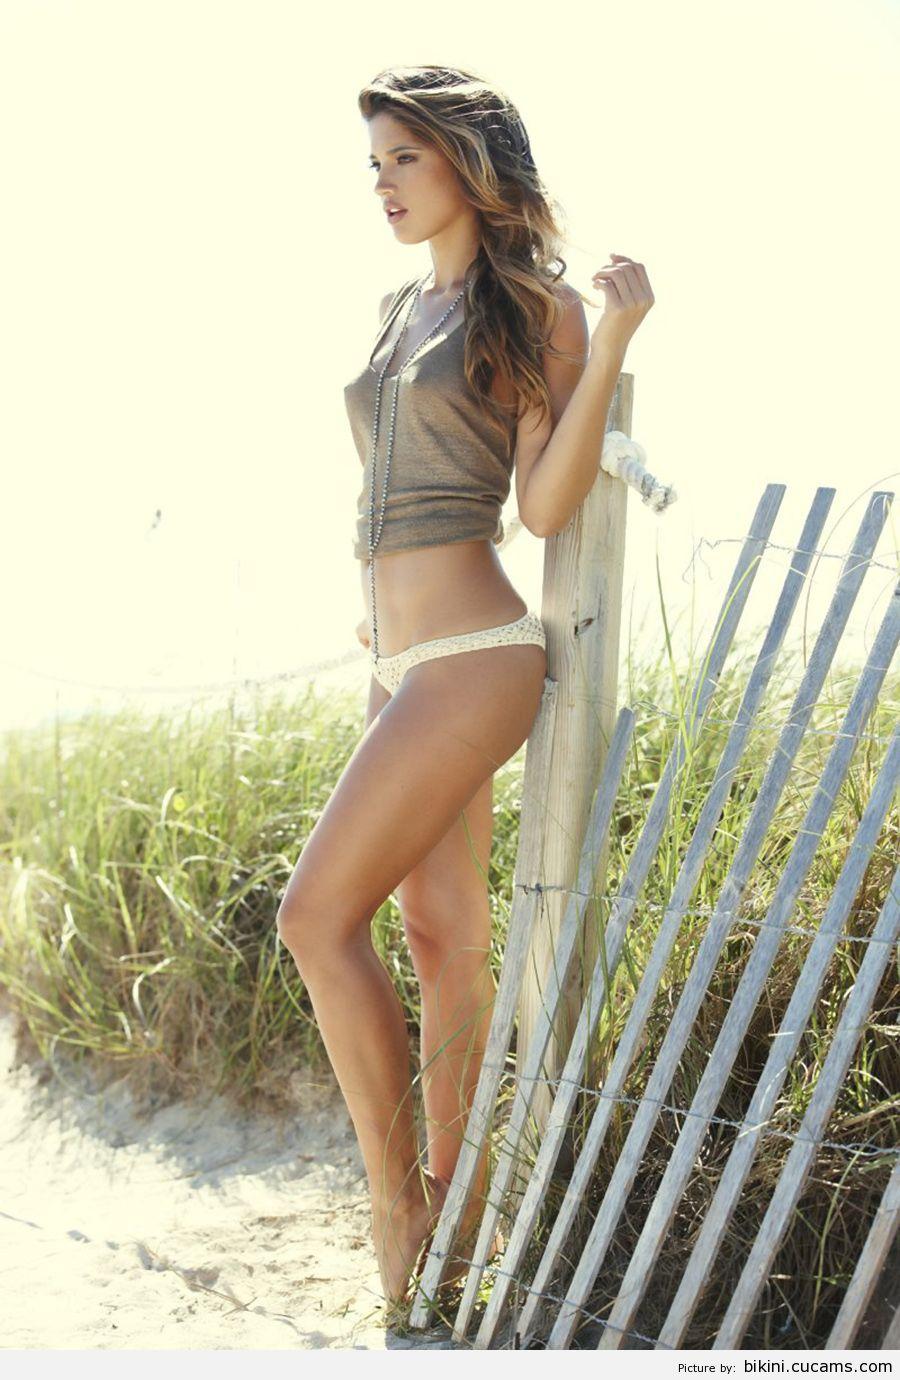 Bikini Revenge Female by bikini.cucams.com